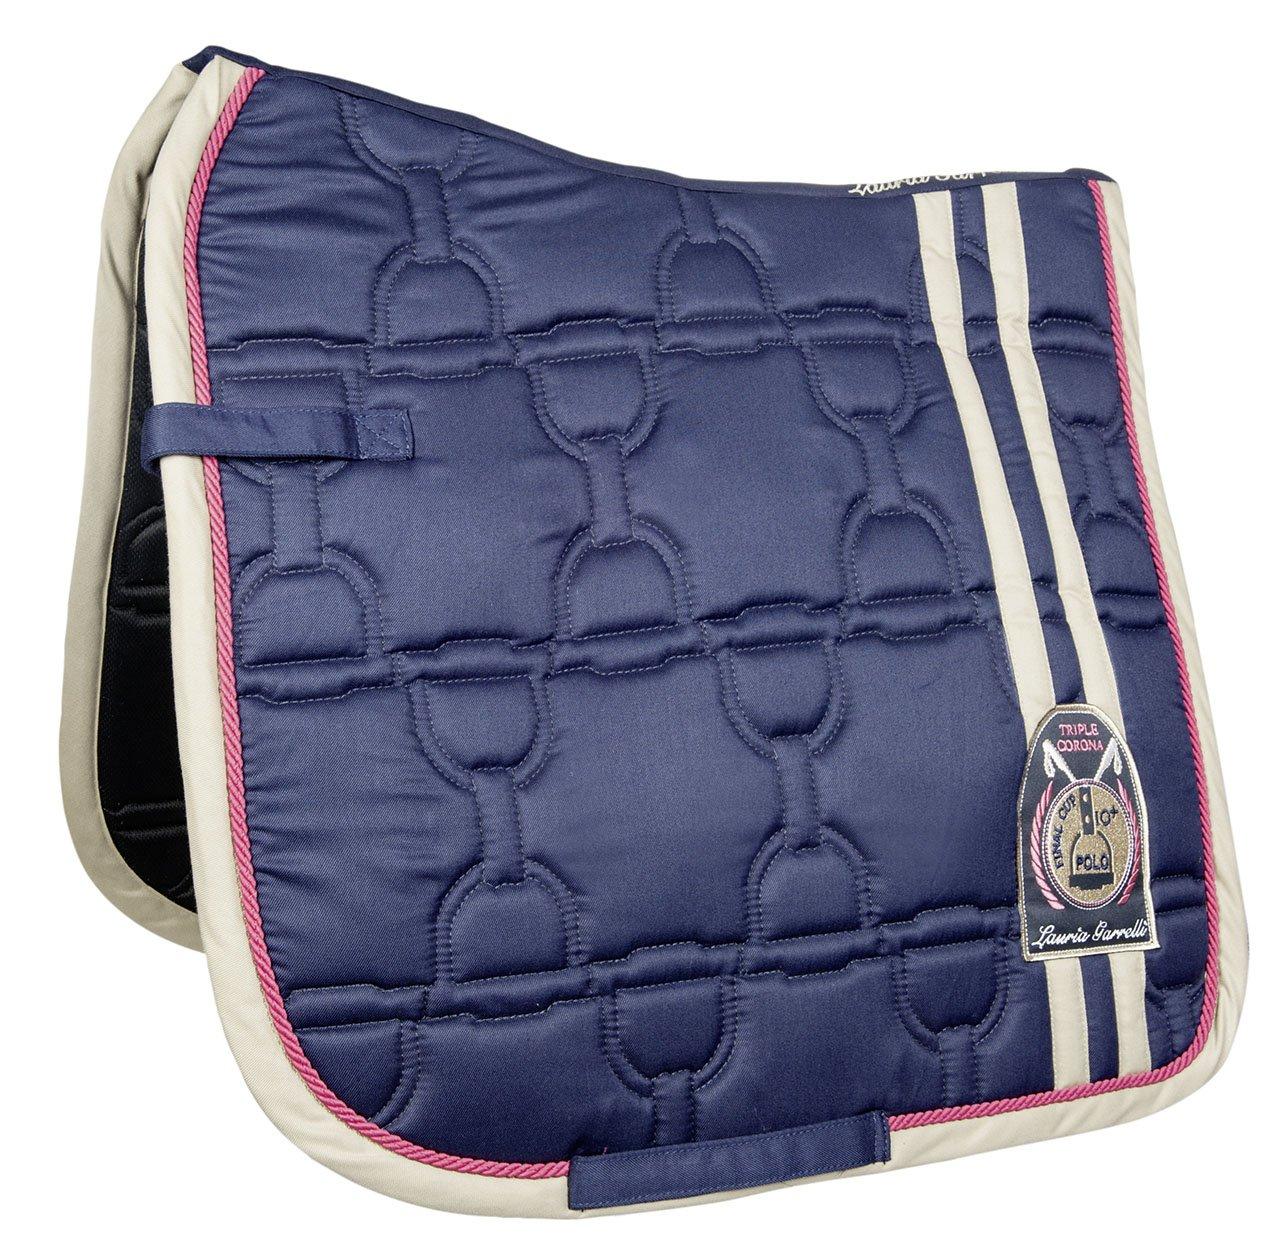 Hkm Hkm 4057052232282 Saddle ClothSanta pink-6900 Dark bluee pony much.